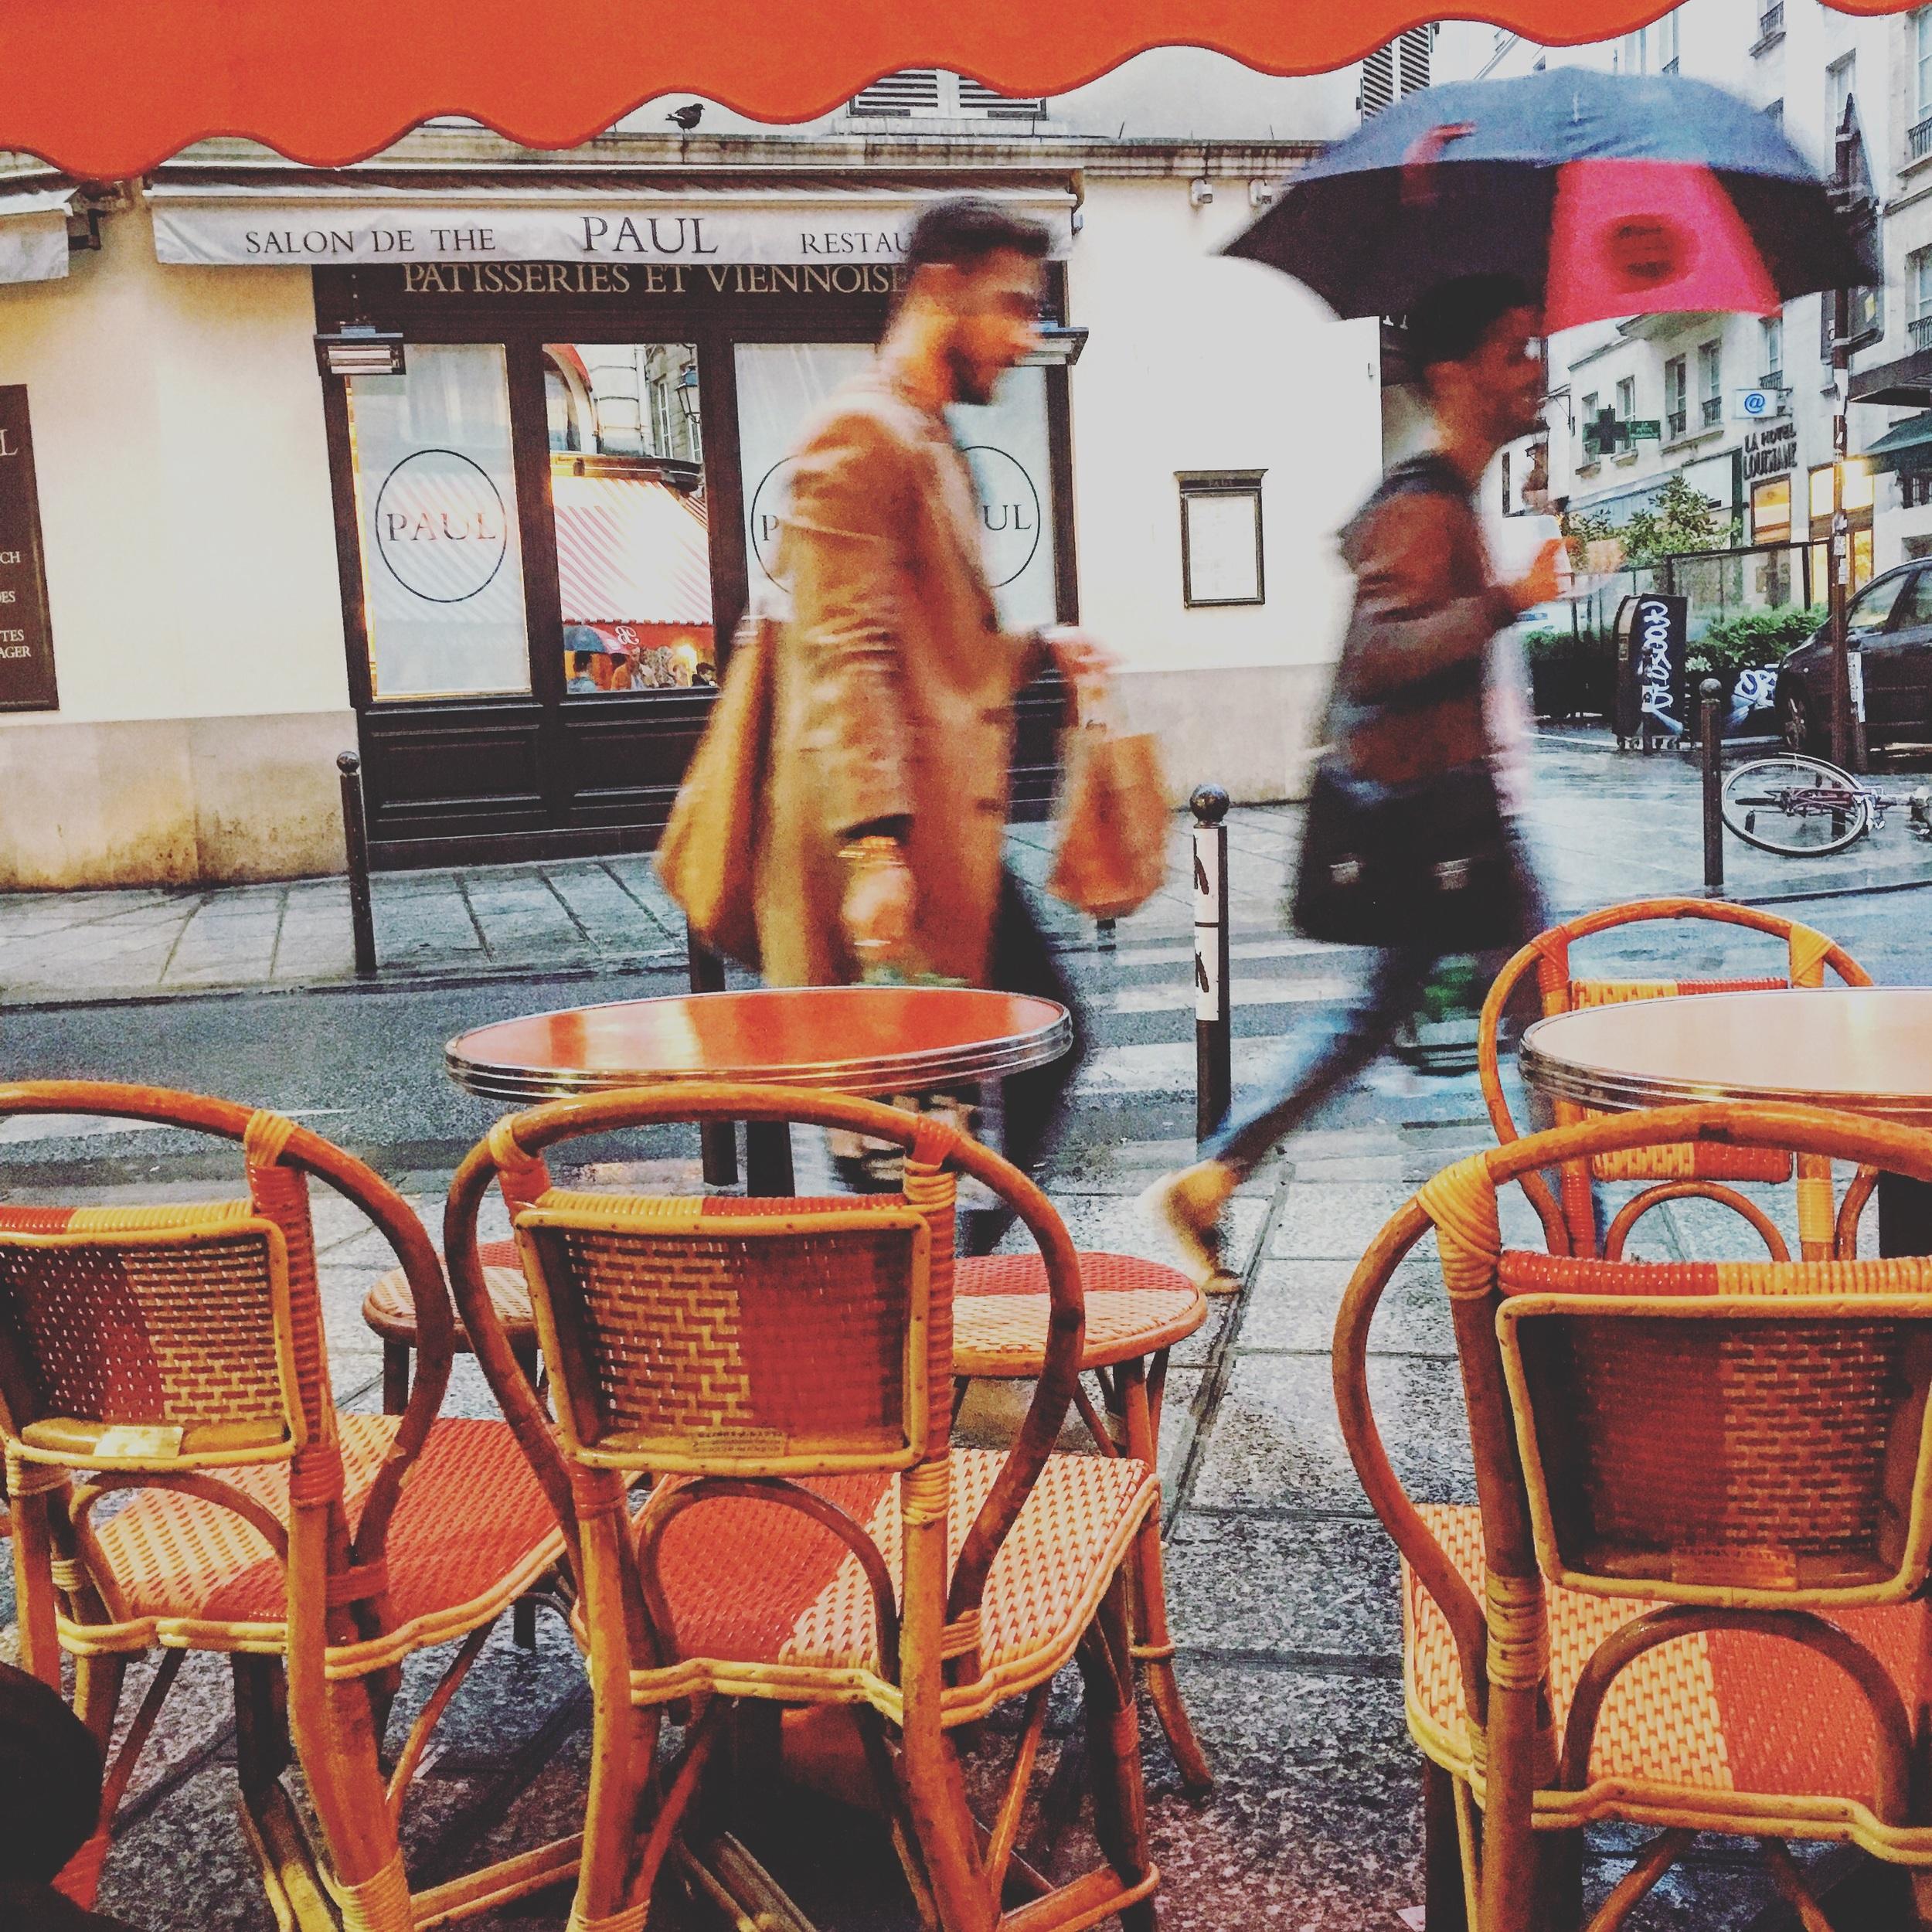 A glass of vin rouge, rain falling, sitting on my Maison J. Gatti ( est. 1920 ) chair. Parfait.